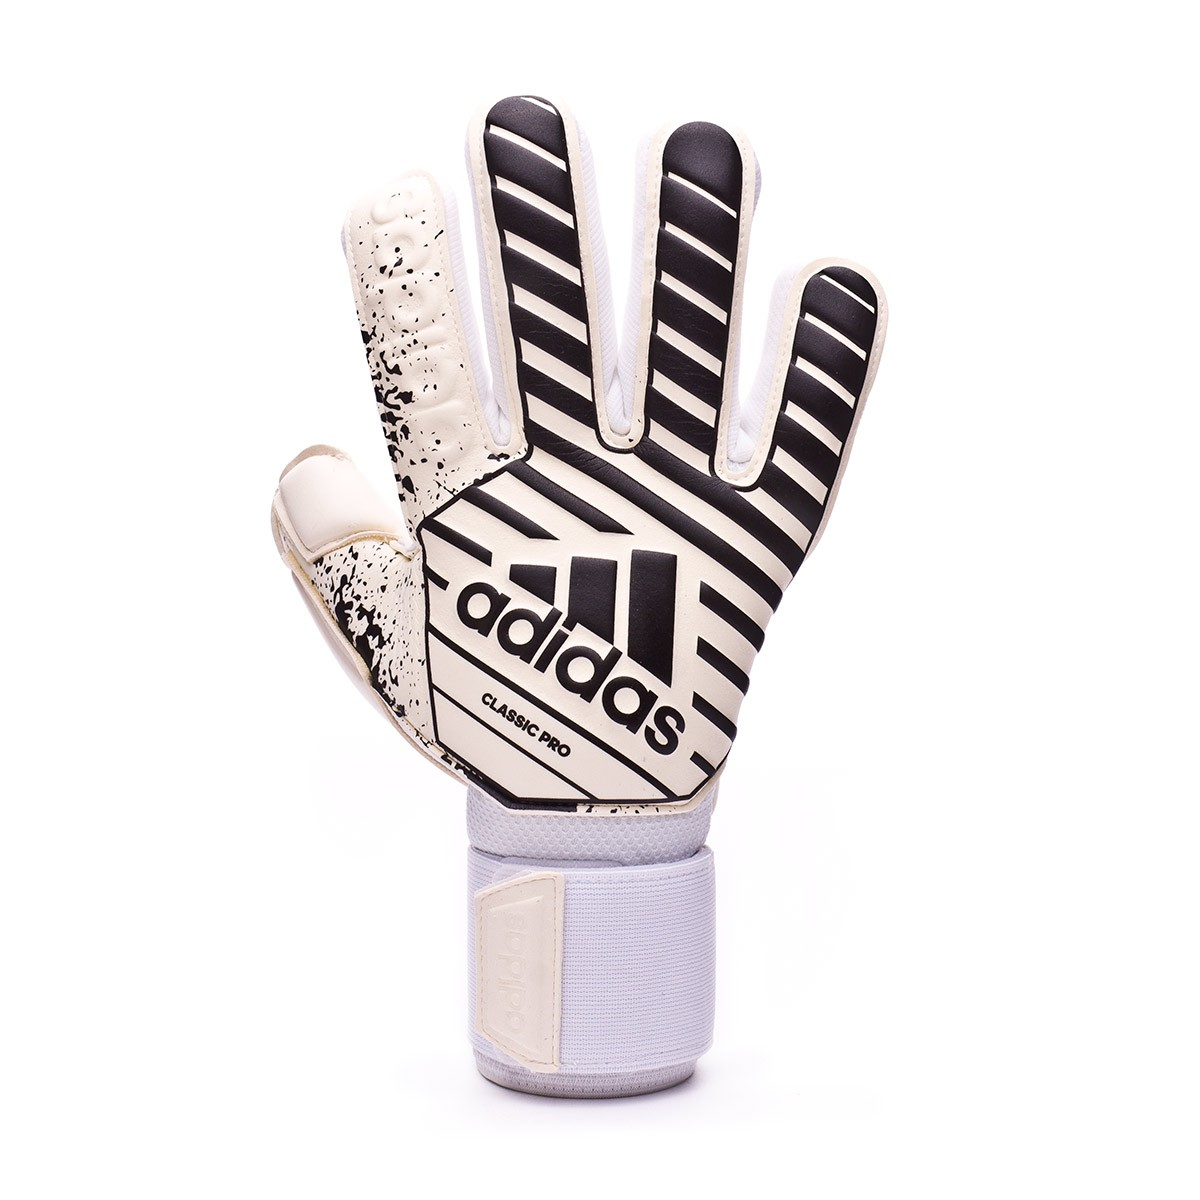 Plano Para buscar refugio Síntomas  Glove adidas Classic Pro White-Black - Football store Fútbol Emotion